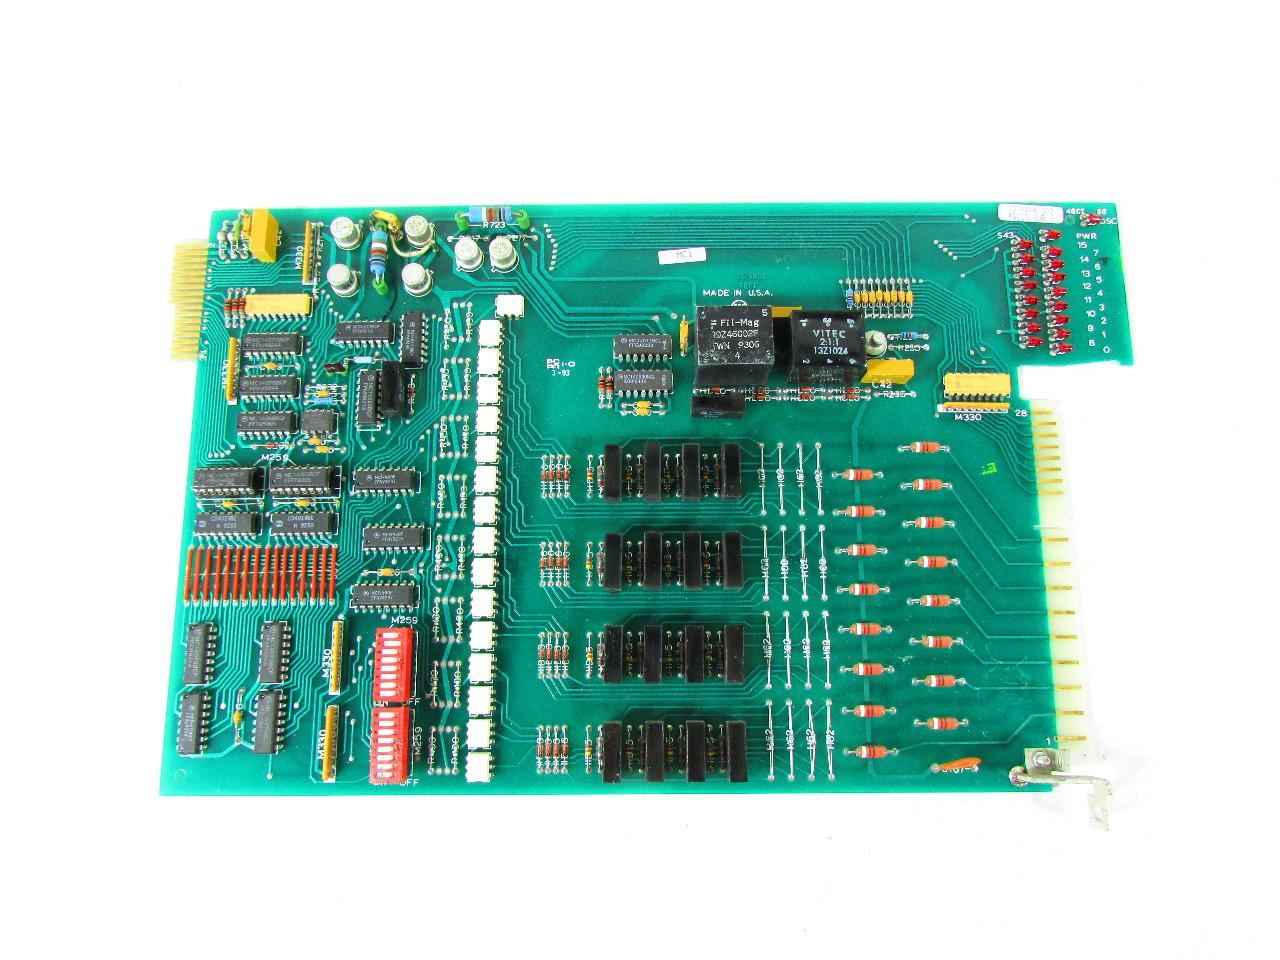 WESTINGHOUSE 7379A06G02 CONTROL CIRCUIT BOARD | Premier Equipment  Solutions, Inc